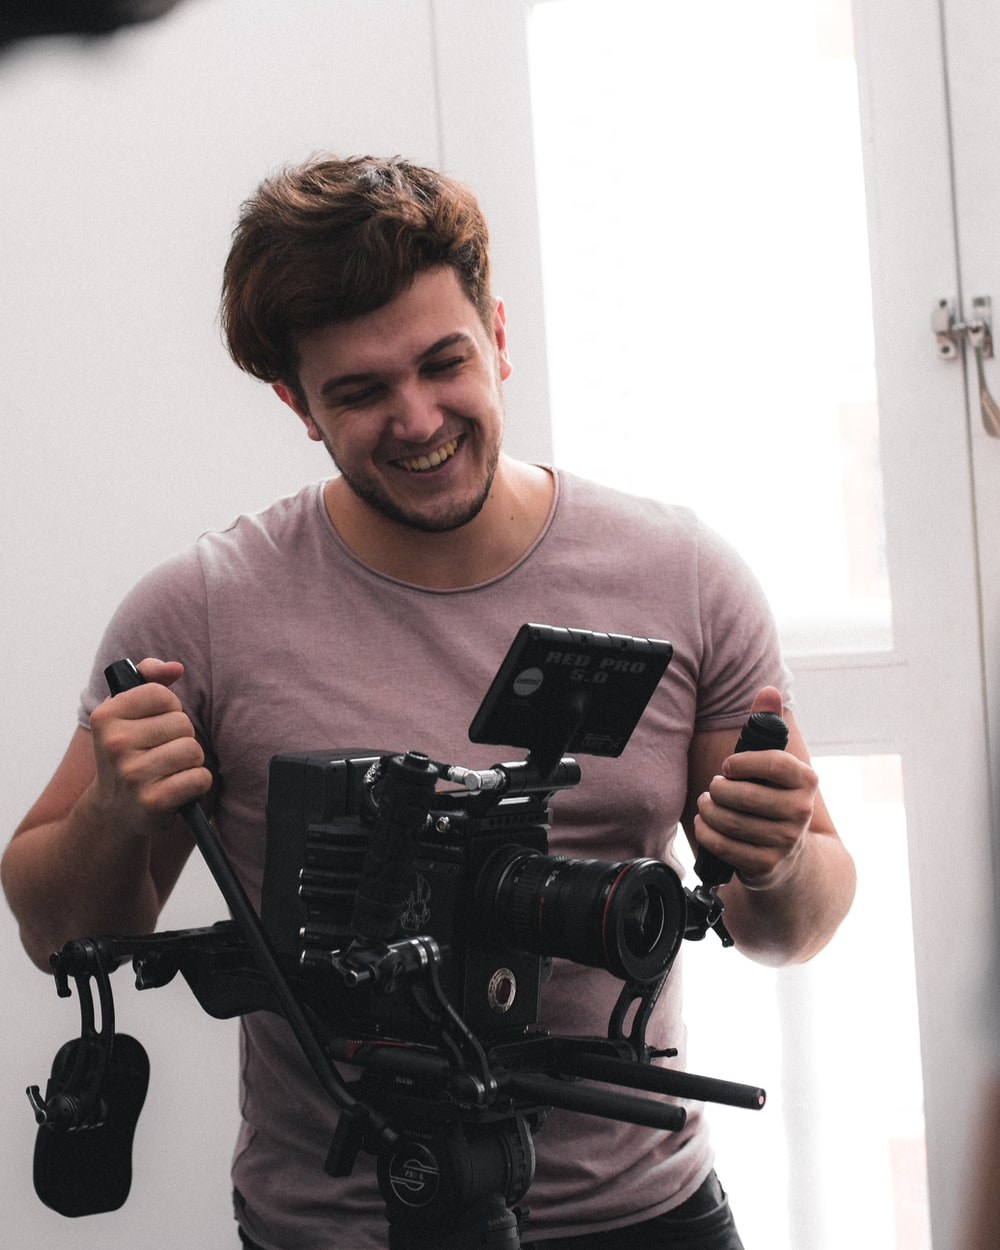 man standing beside DSLR camera